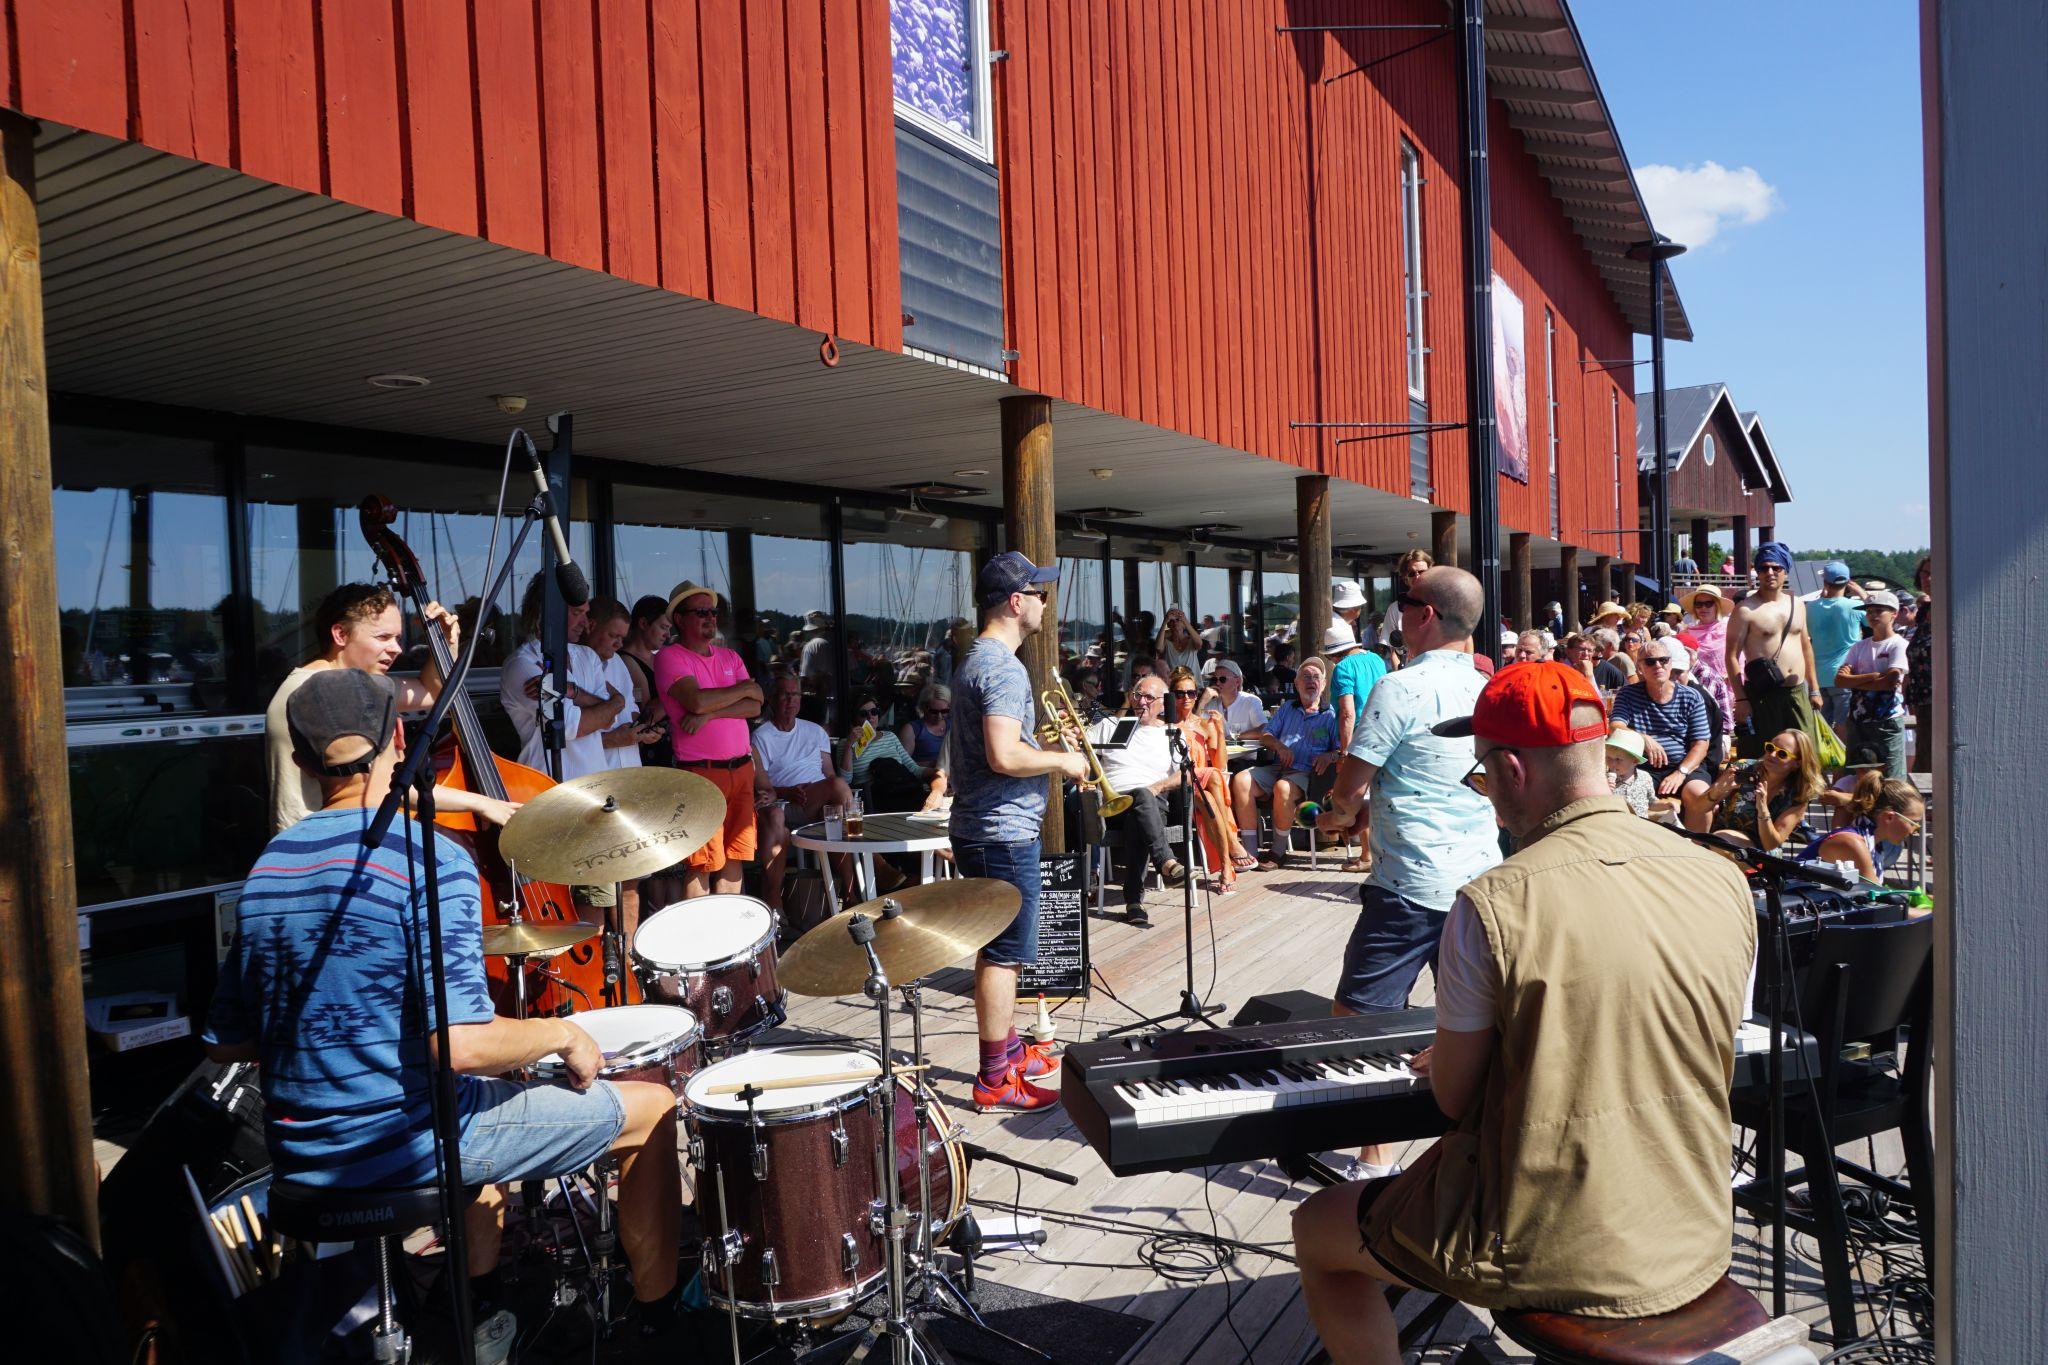 Korpo Sea Jazz in Korpoström is a must-see